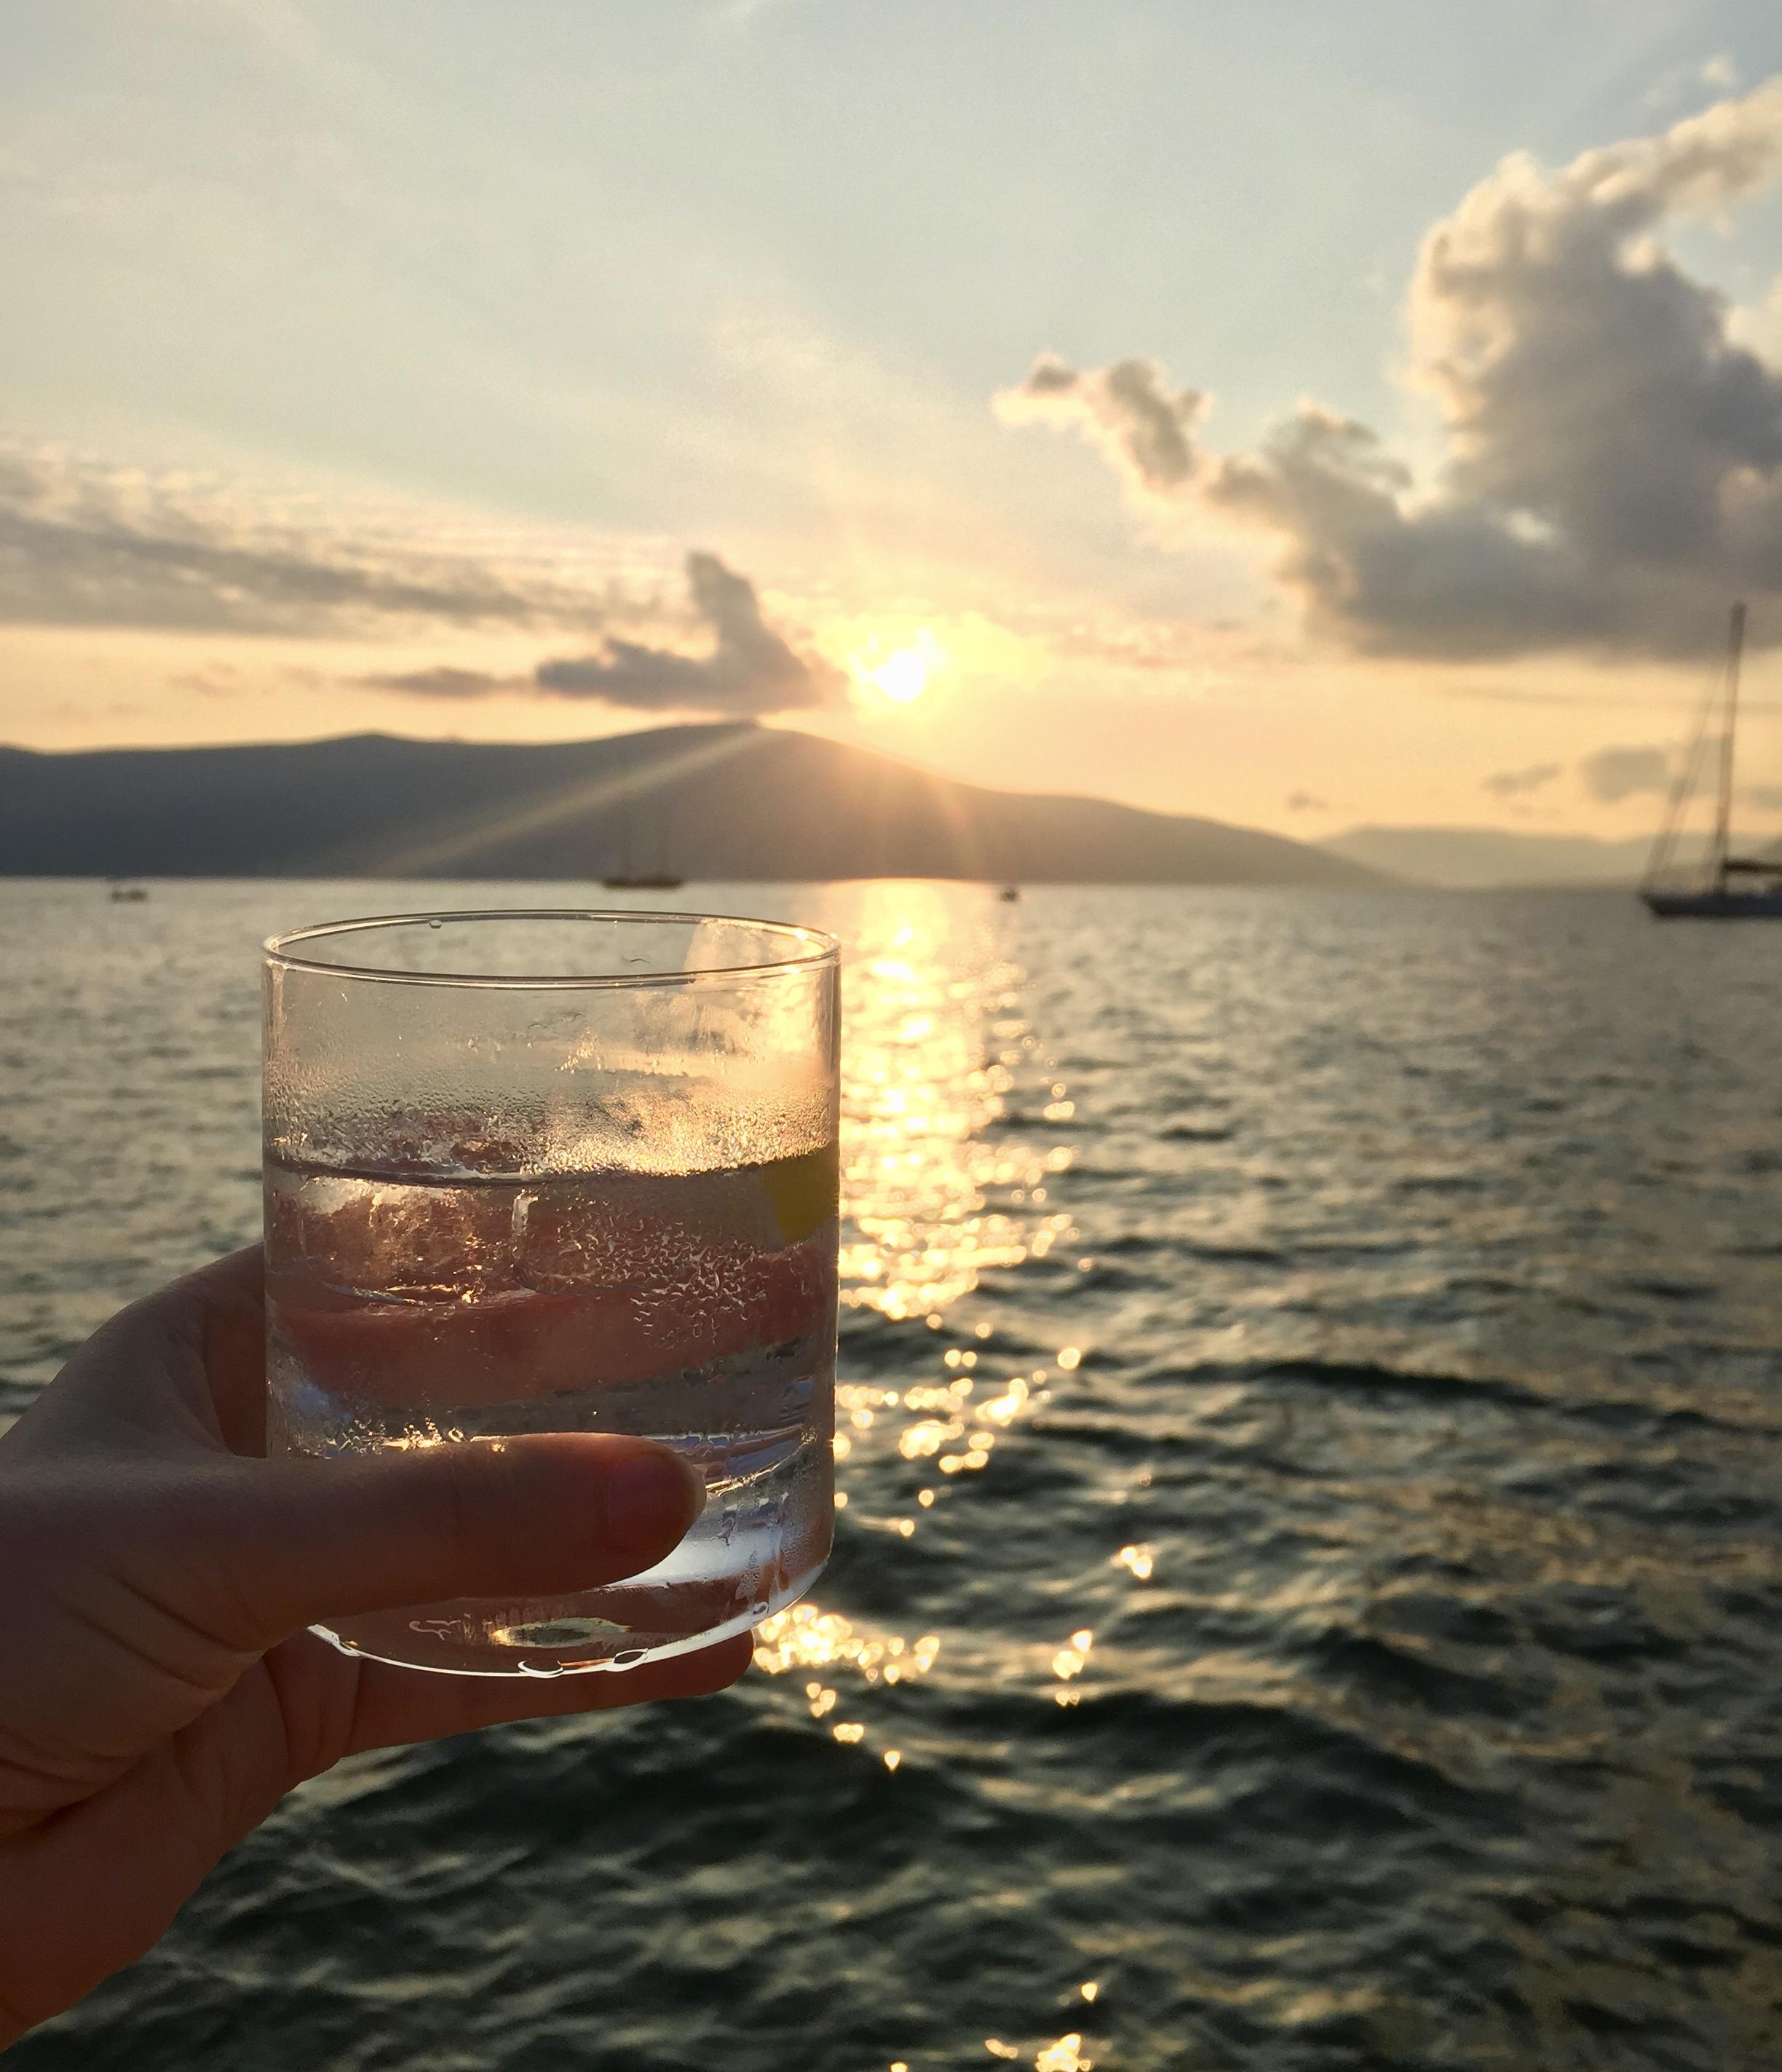 gintonic Tivat Montenegro sunset